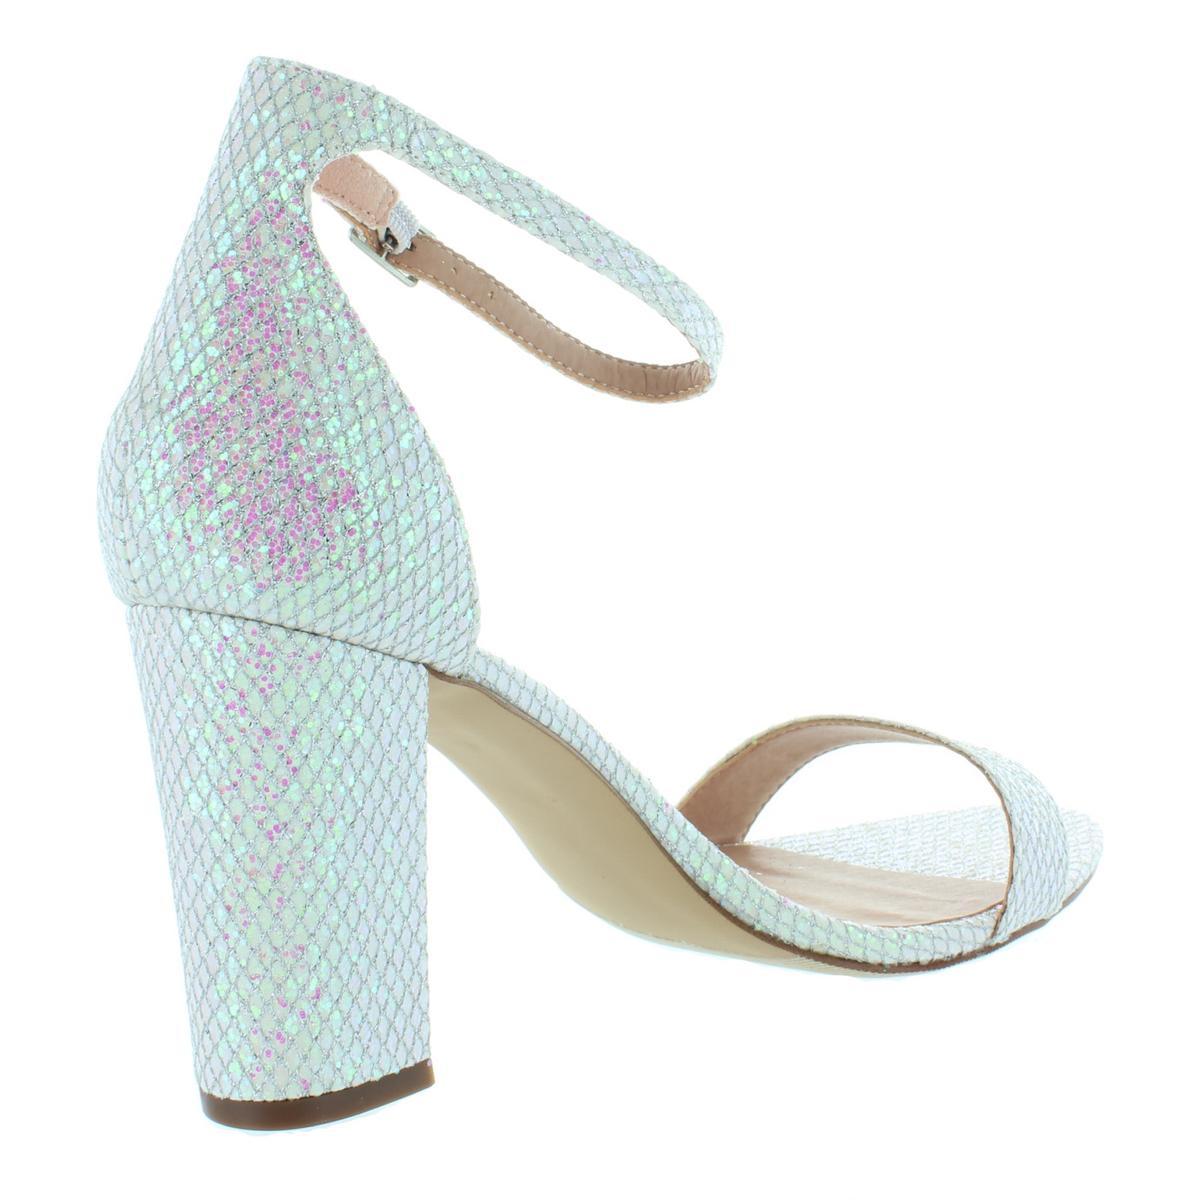 Madden-Girl-Womens-Beella-Heels-Dress-Sandals-Shoes-BHFO-0922 thumbnail 8